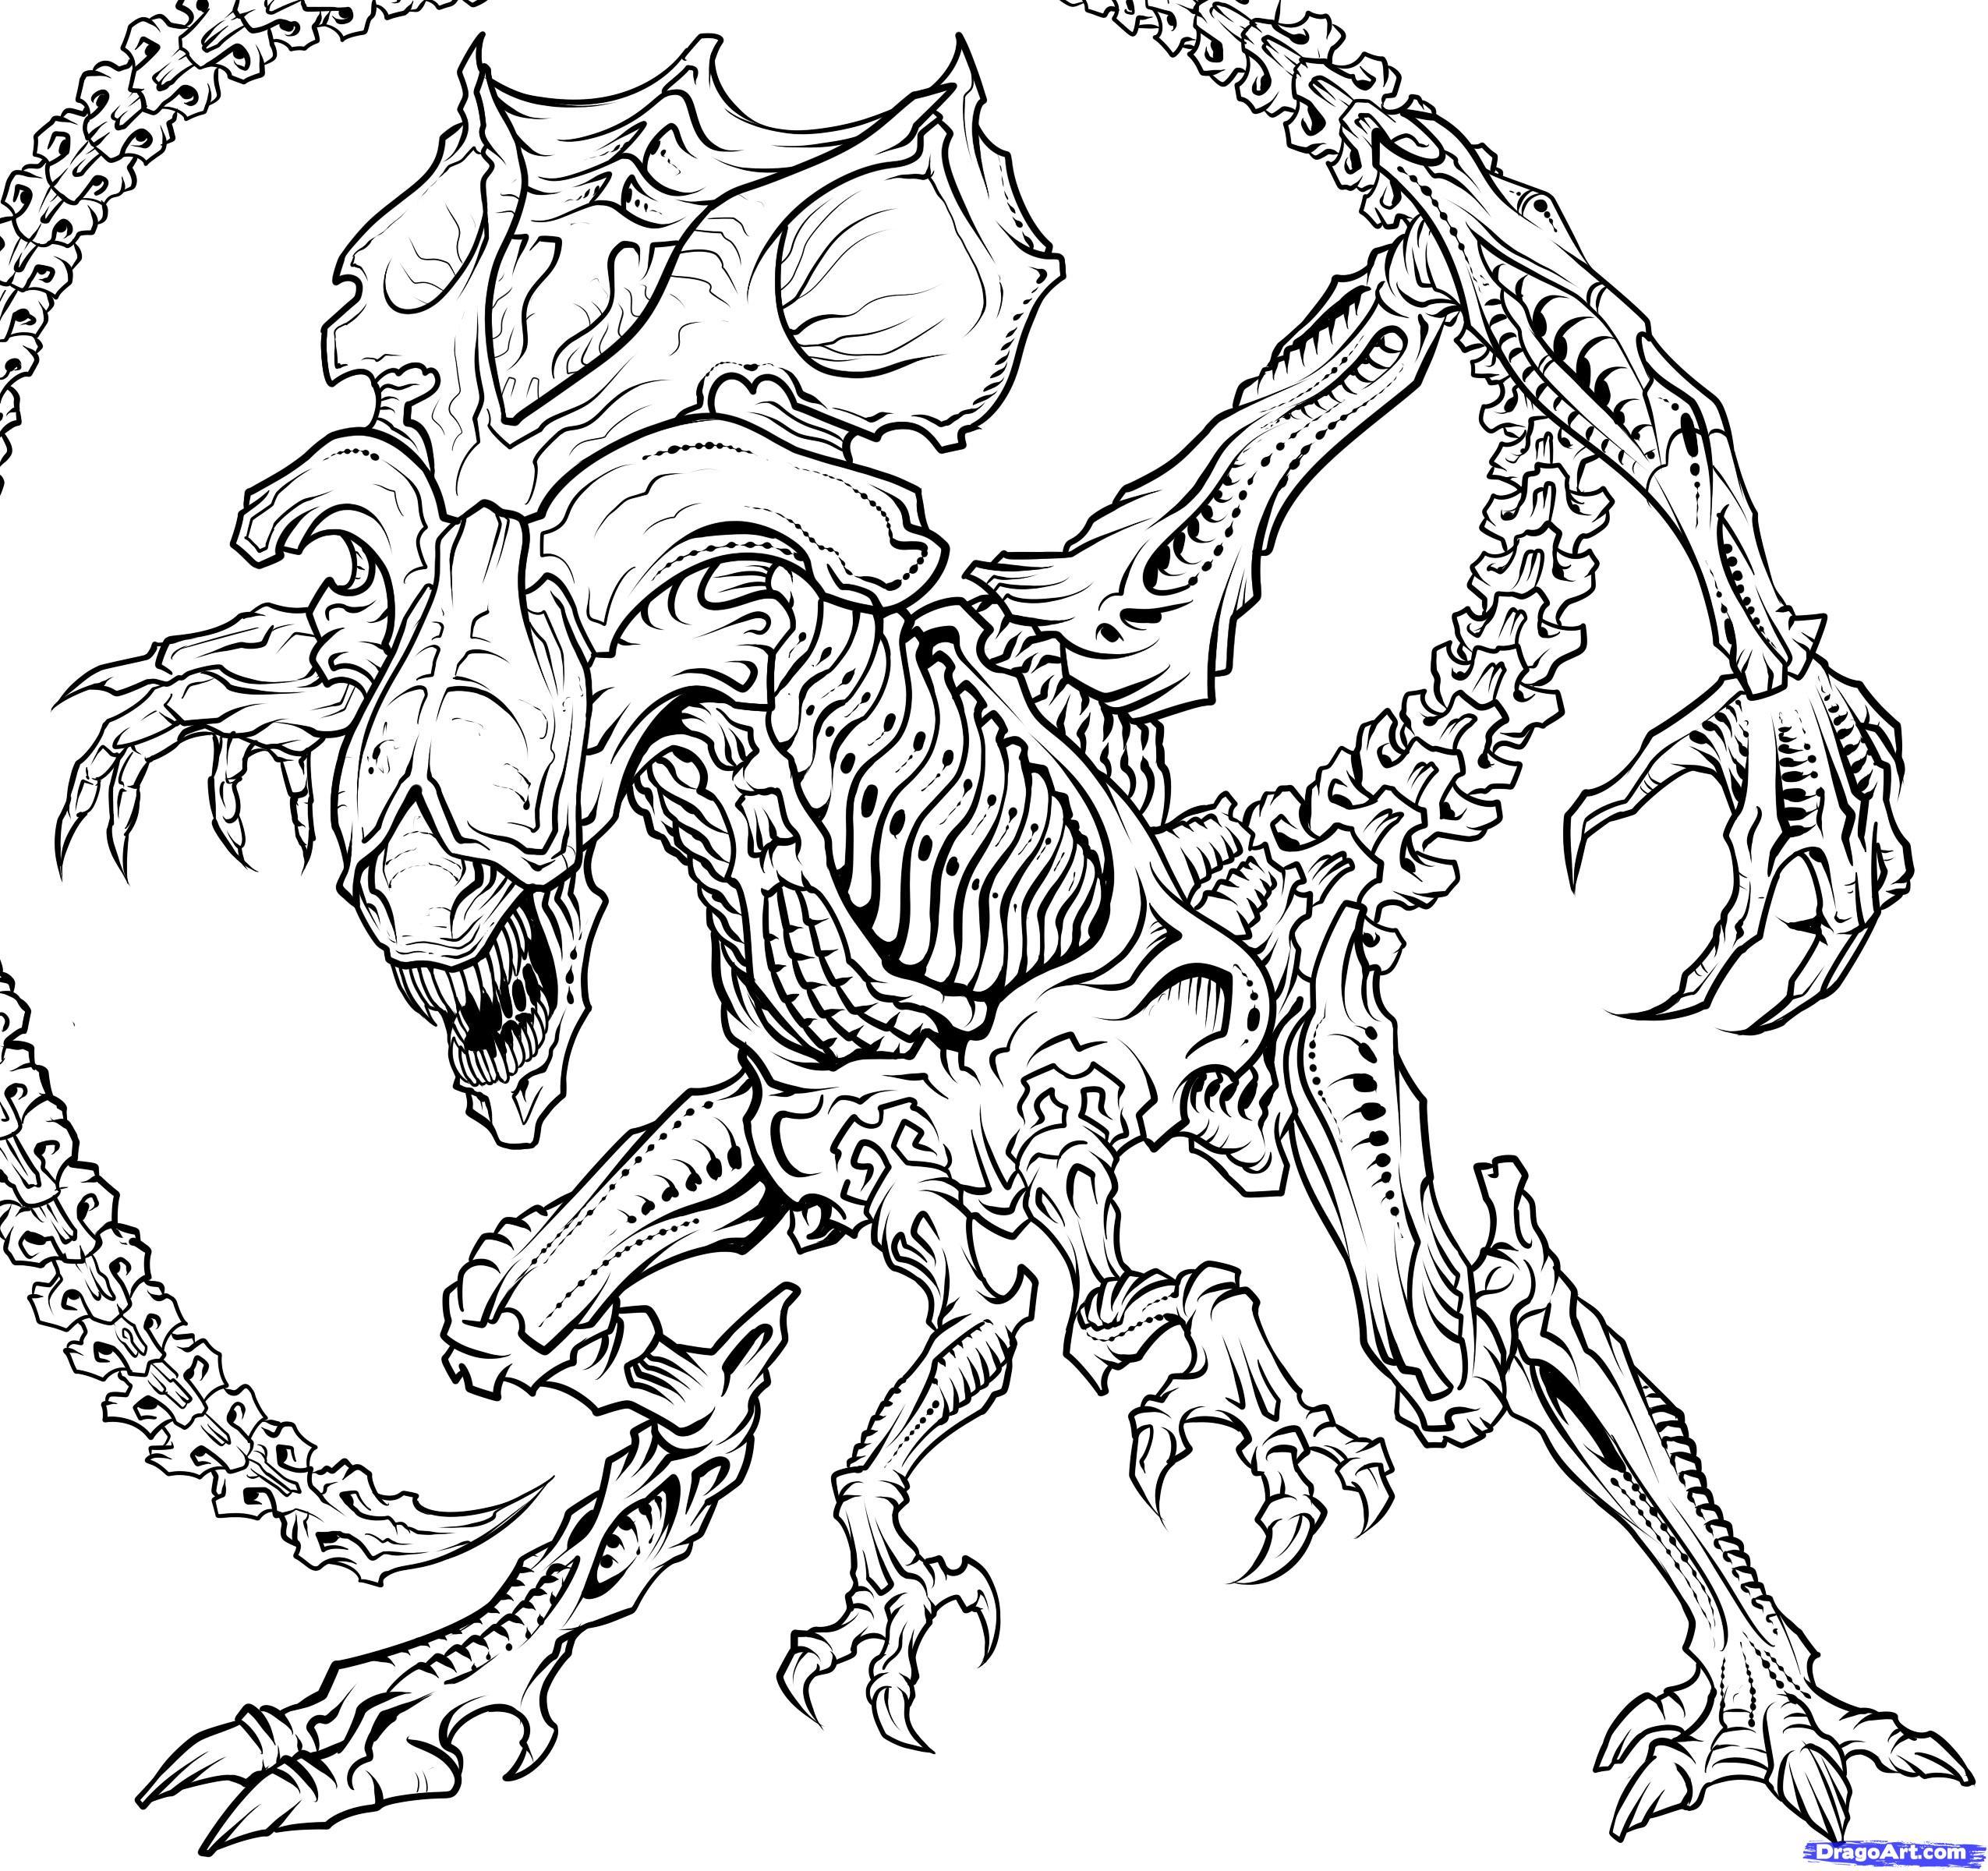 2550x2400 Drawing Of An Alien 14. How To Draw A Queen Alien, Queen Xenomorph